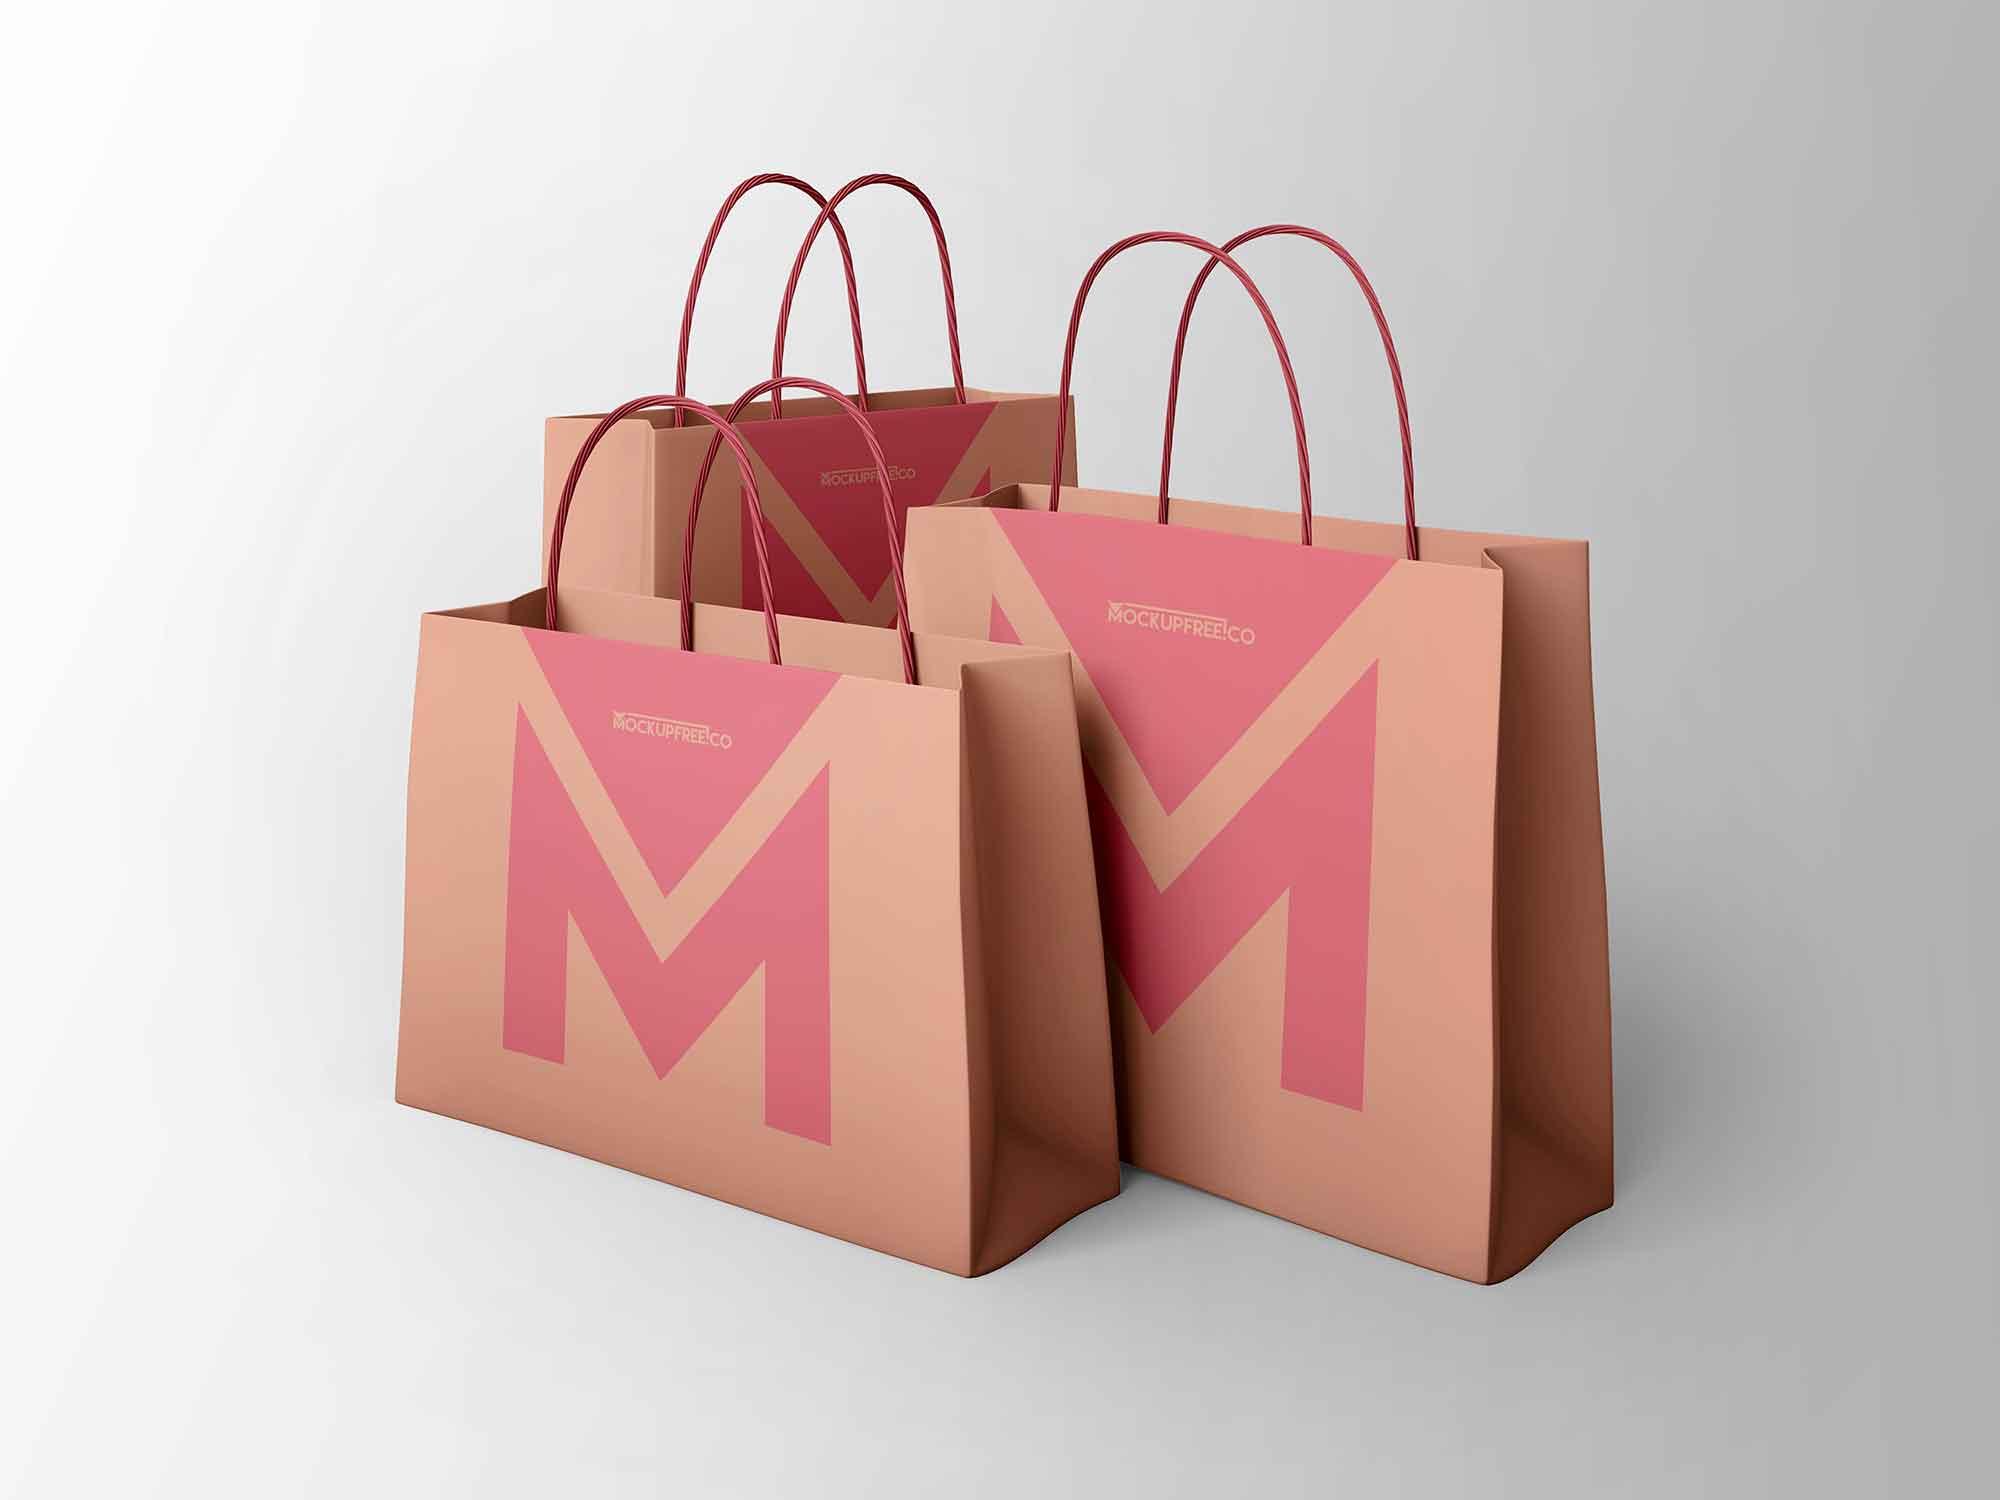 Free 19+ psd paper bag mockups in psd | indesign | ai. 3 Paper Bags Mockup Psd